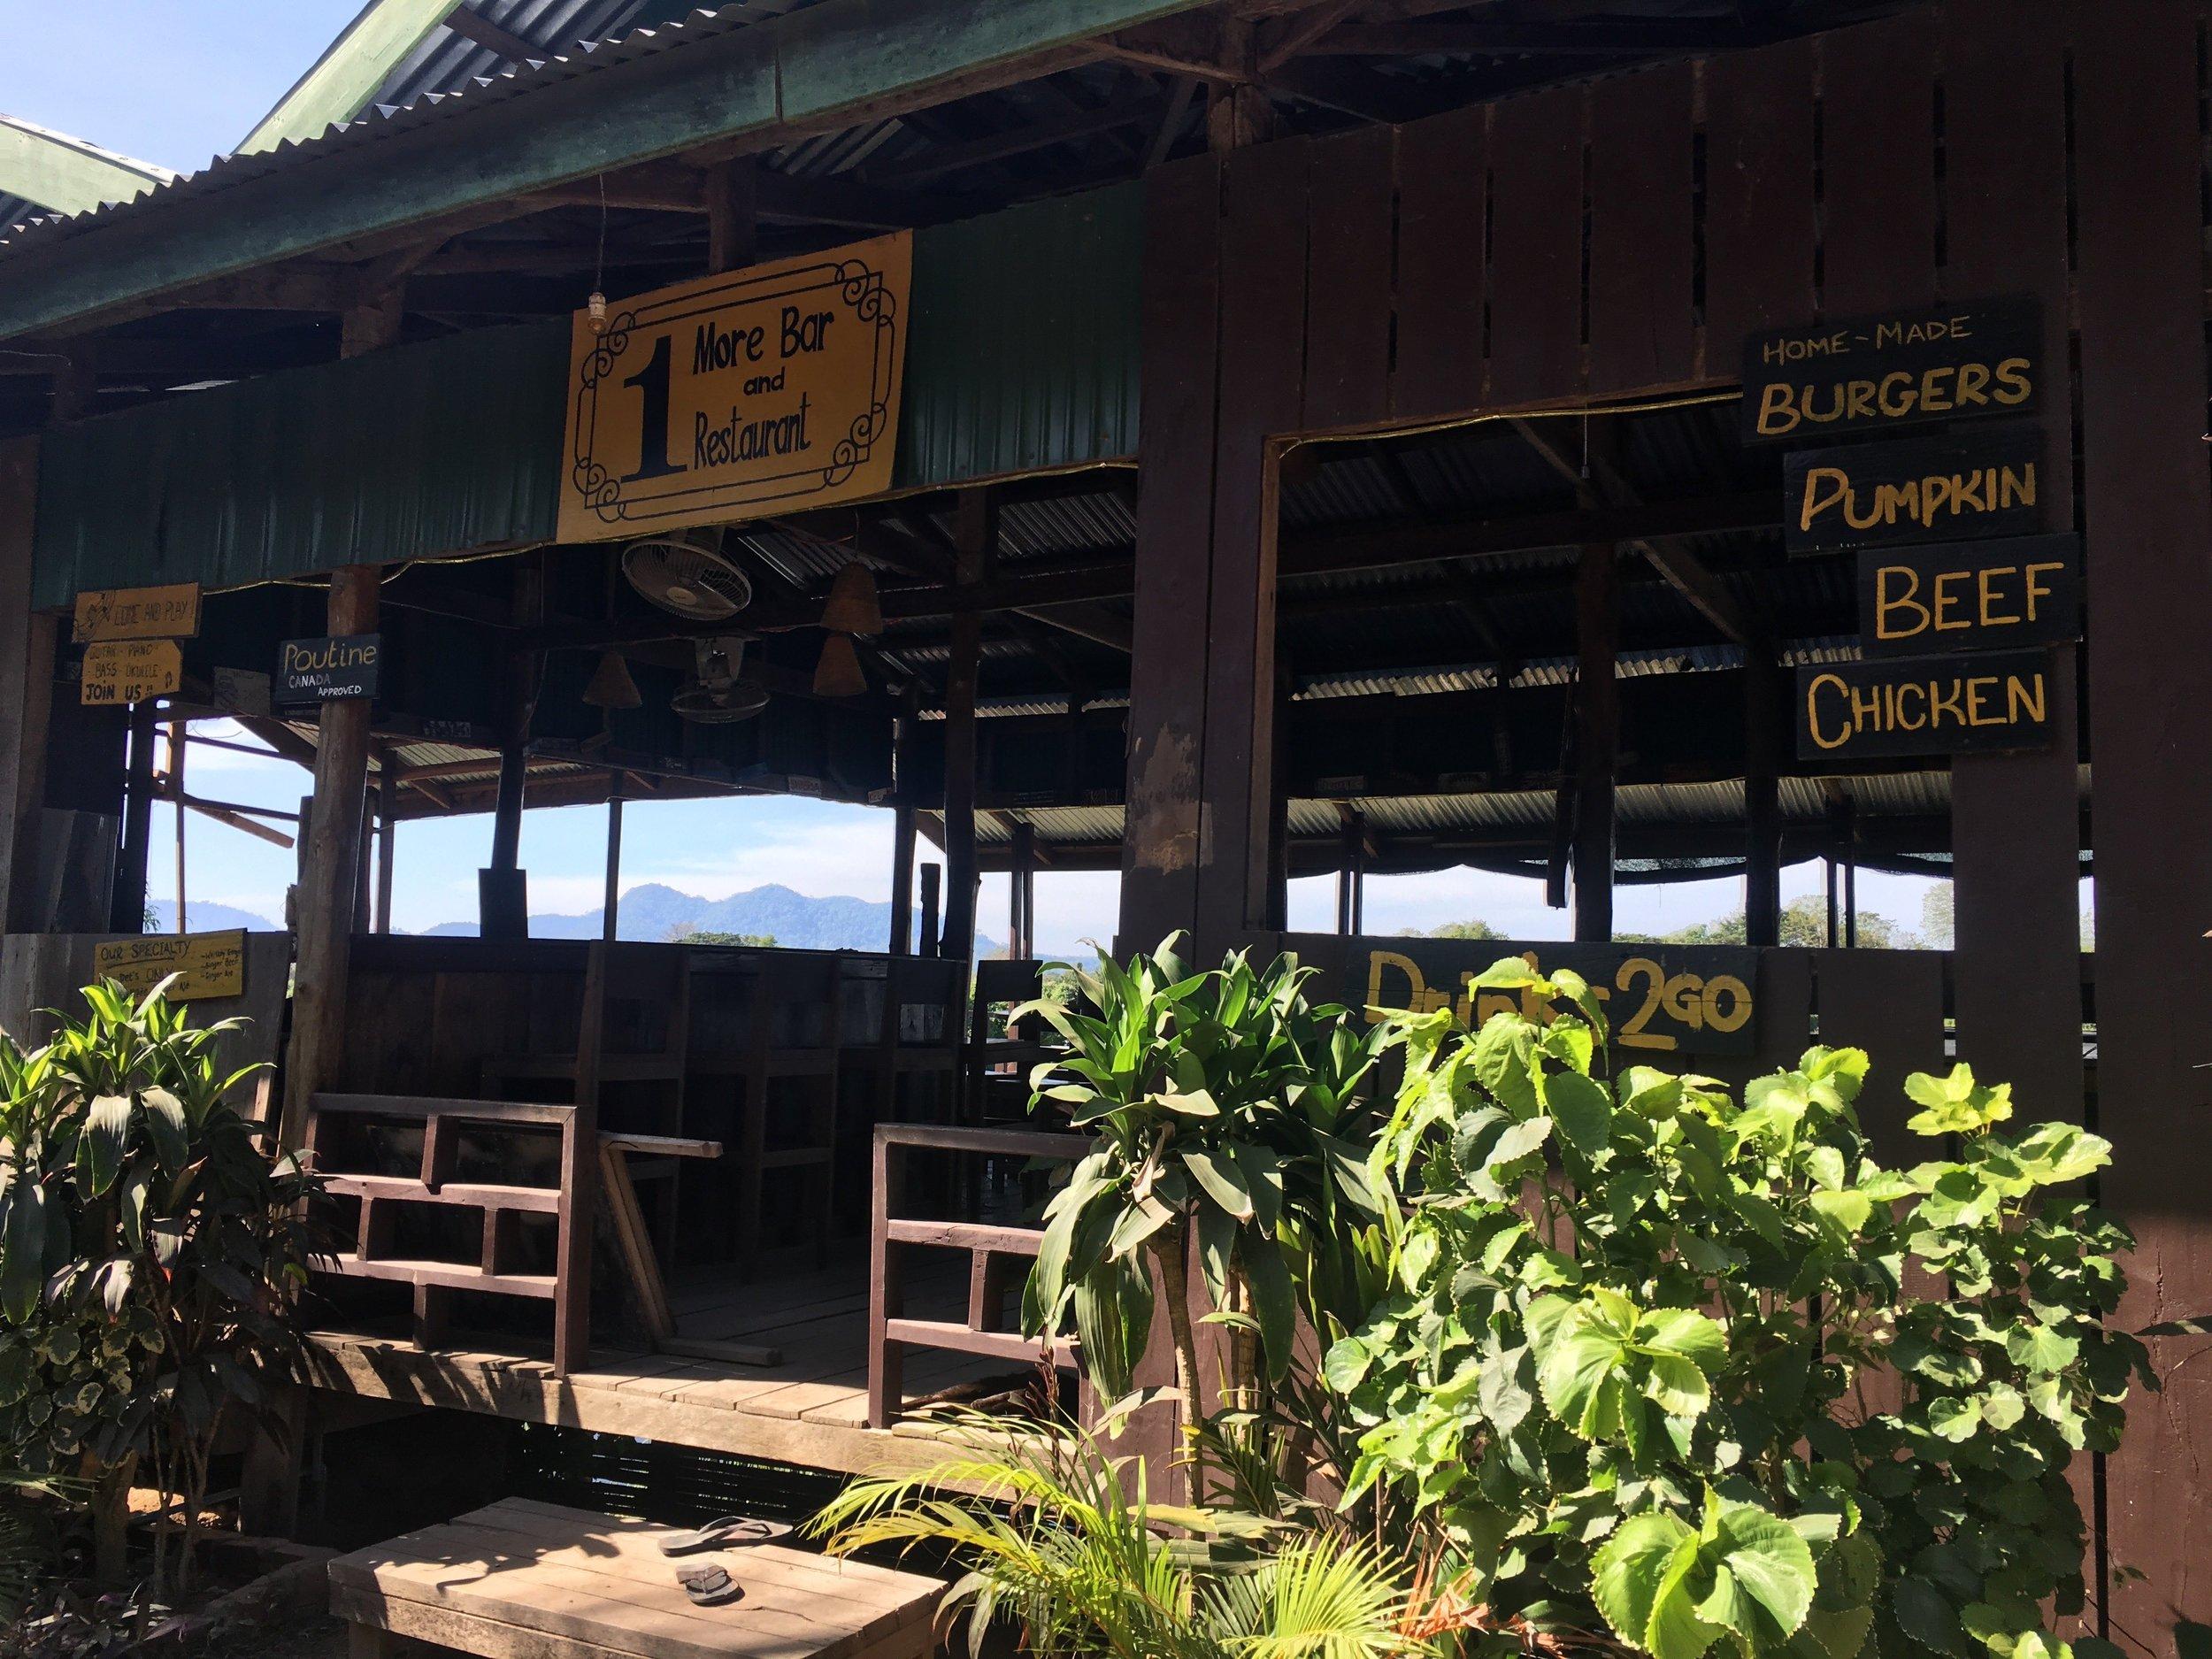 1 More Bar and Restaurant |© Regina Beach